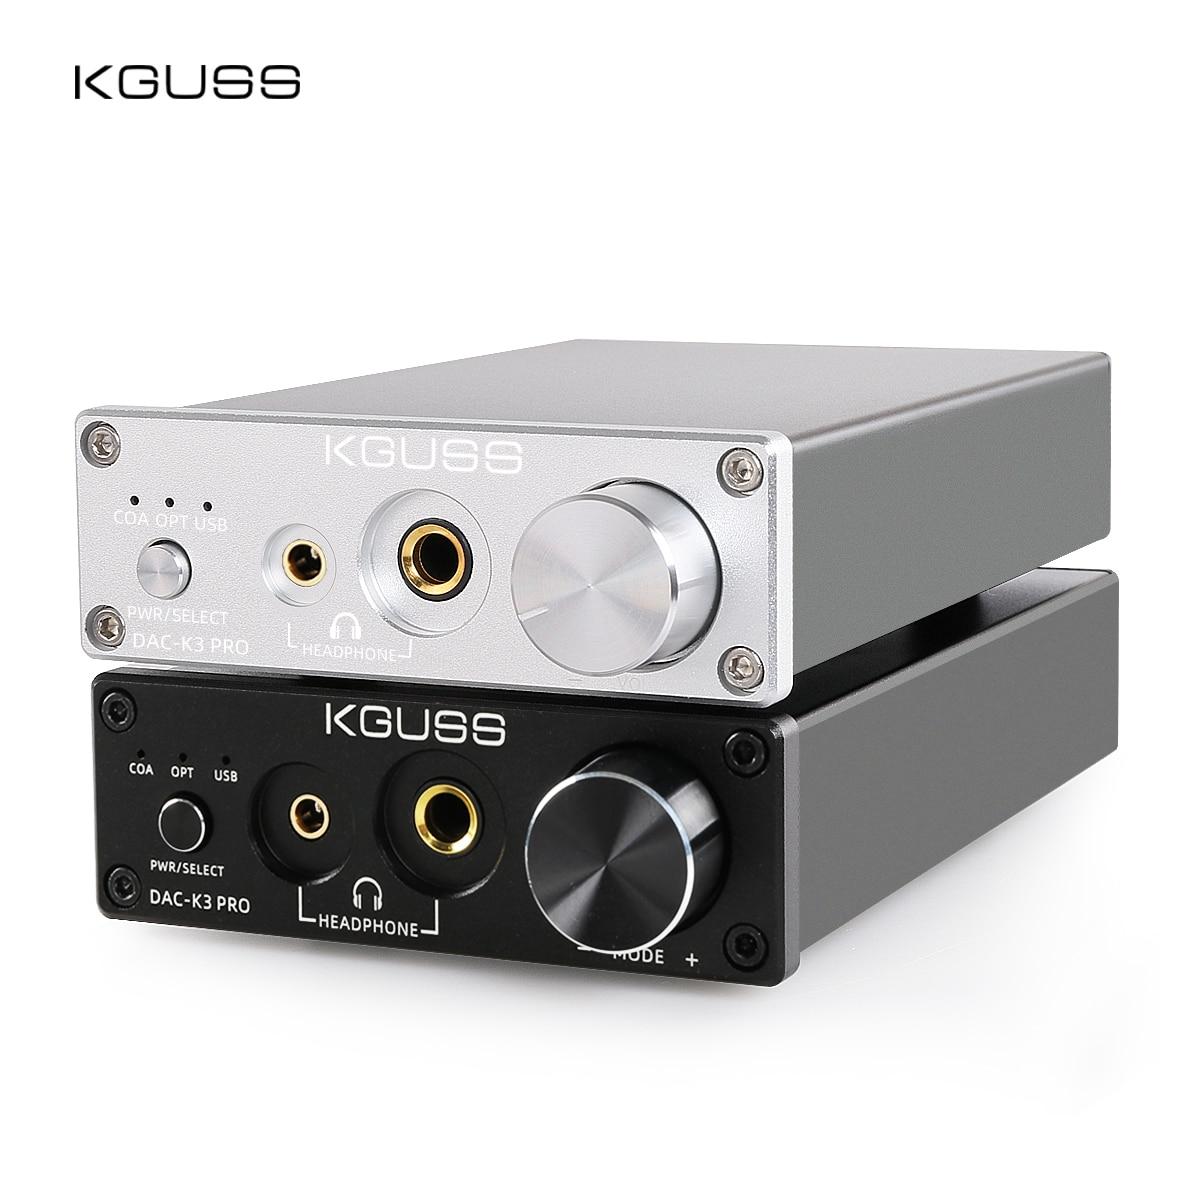 KGUSS DAC-K3PRO TPA6120A2 ESS9018K2M MINI HIFI USB DAC Decoded Audio Headphone Amplifier 24BIT 192KHz AMP DC12V  US/EU